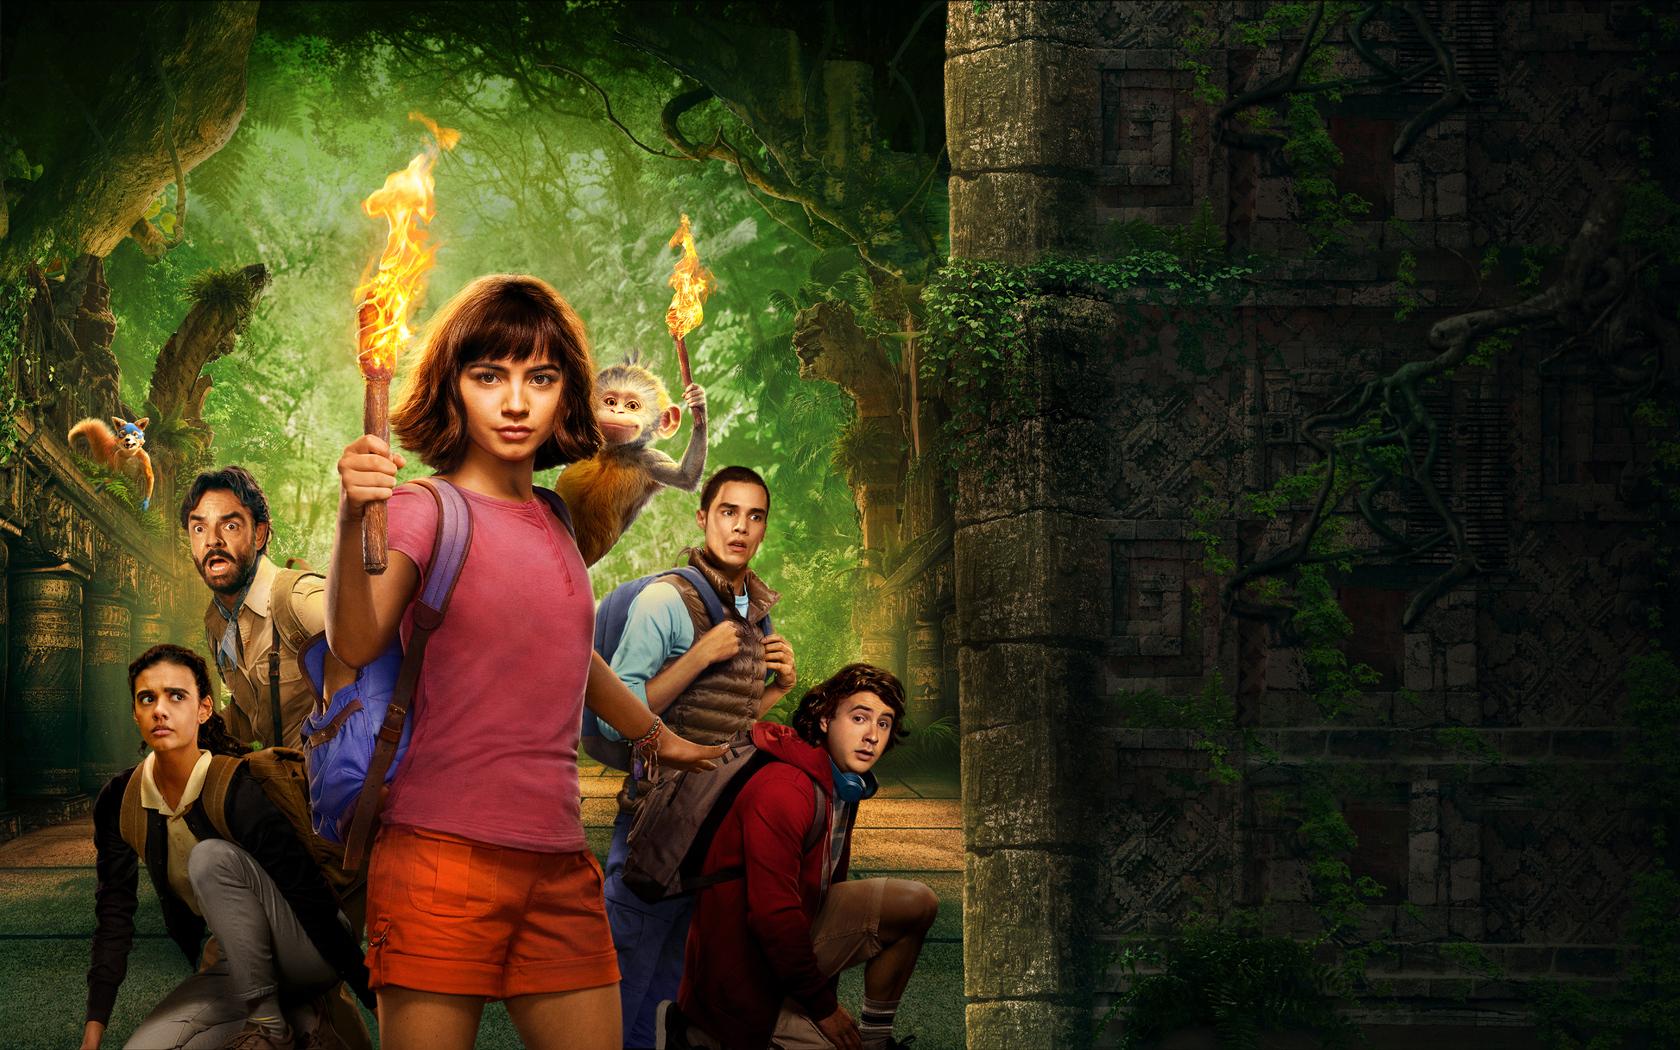 dora-the-explorer-movie-8k-15.jpg